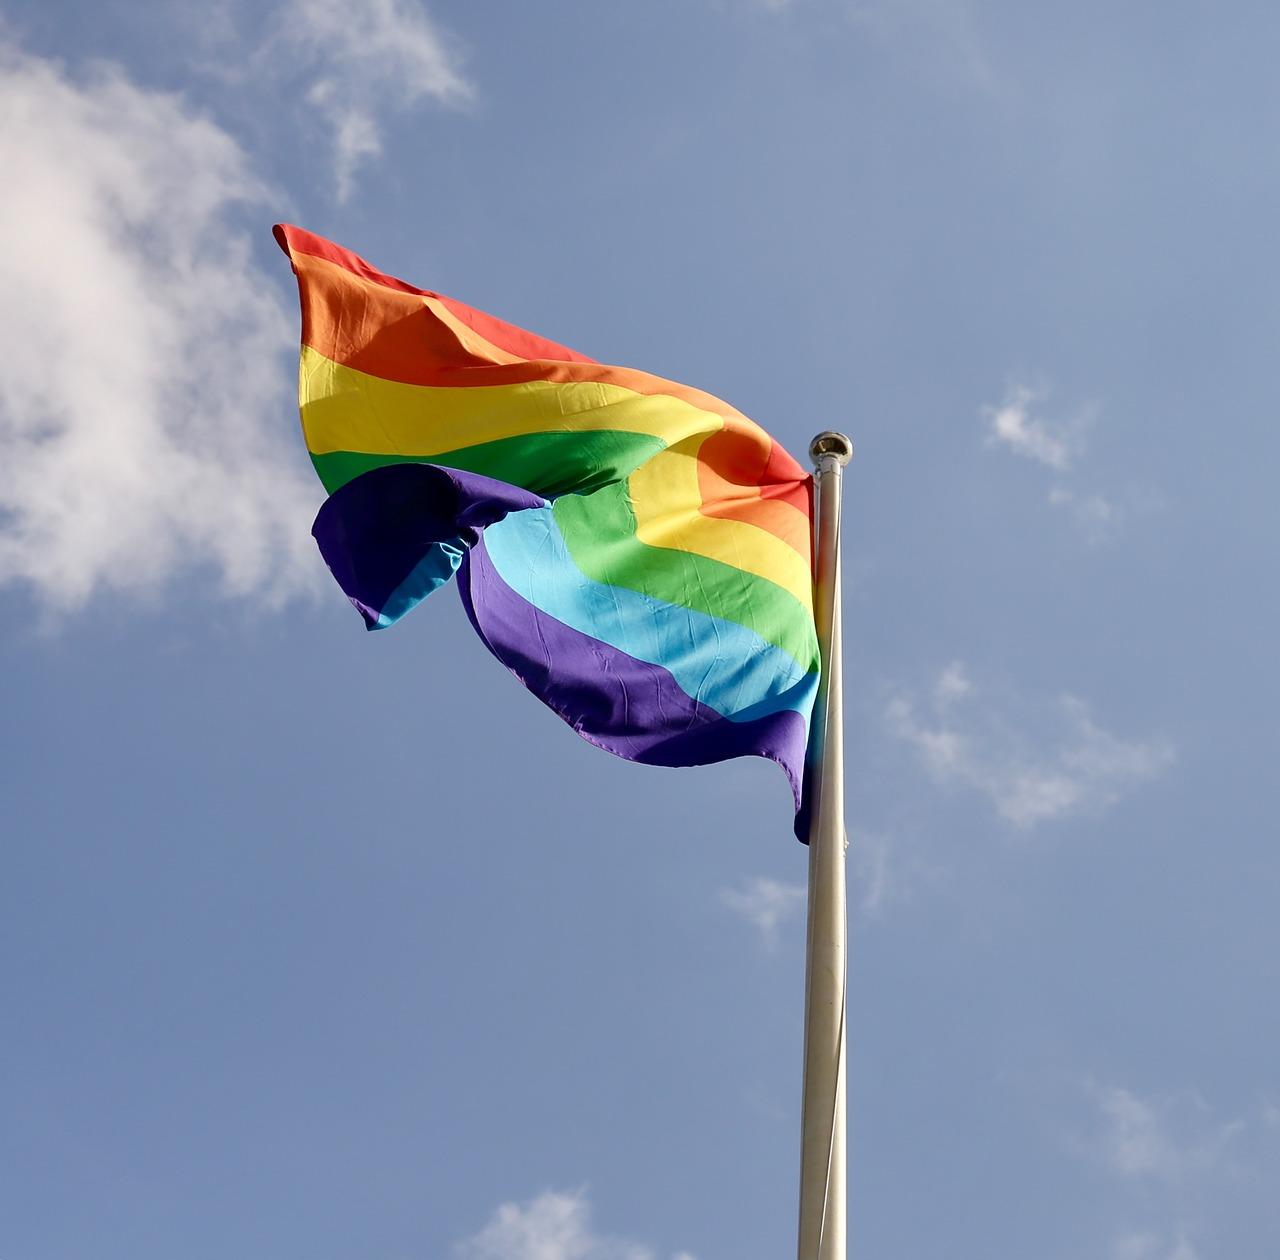 Eclipse 2017 En Houston >> LGBT 'Acceptance Panel' on Transgenderism, Gender Identity to Be Hosted at Virginia Public Schools